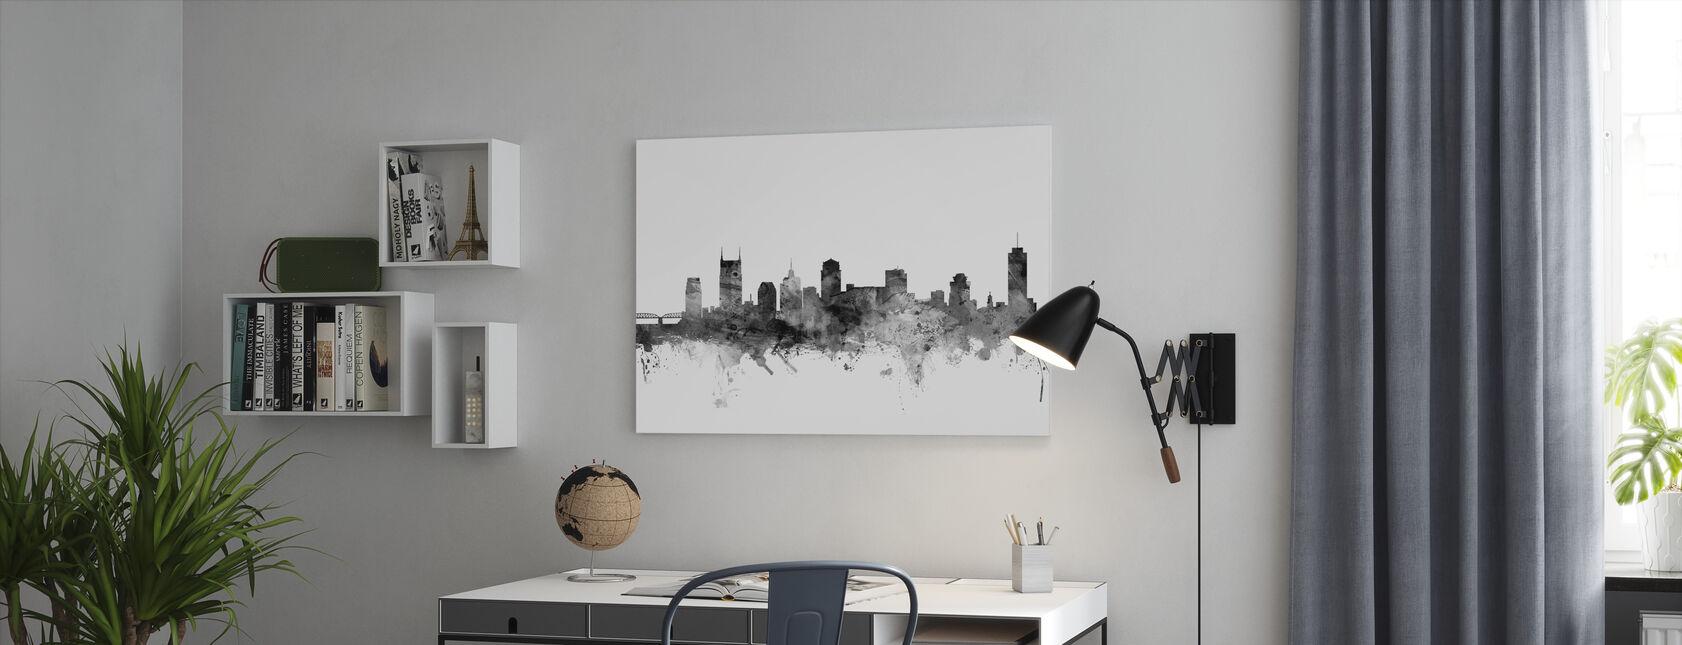 Nashville Tennessee Skyline Black - Canvas print - Office